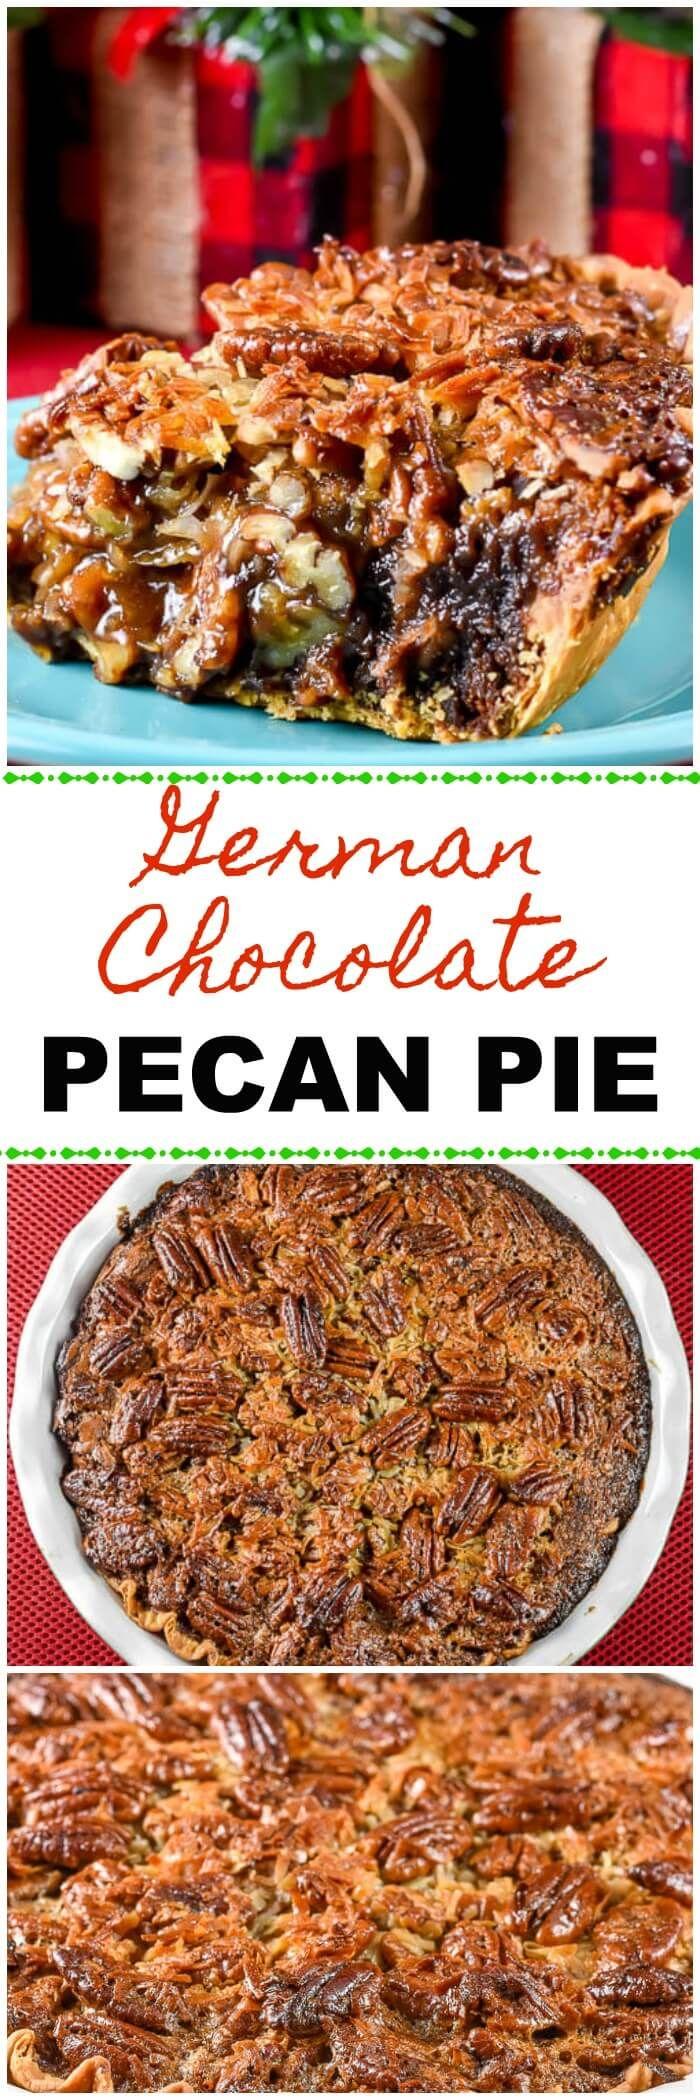 This German Chocolate Pecan Pie combines German Chocolate Cake and Pecan Pie into one fabulous holiday dessert!  #GermanChocolatePecanPie #PecanPie #HolidayDessert via @flavormosaic